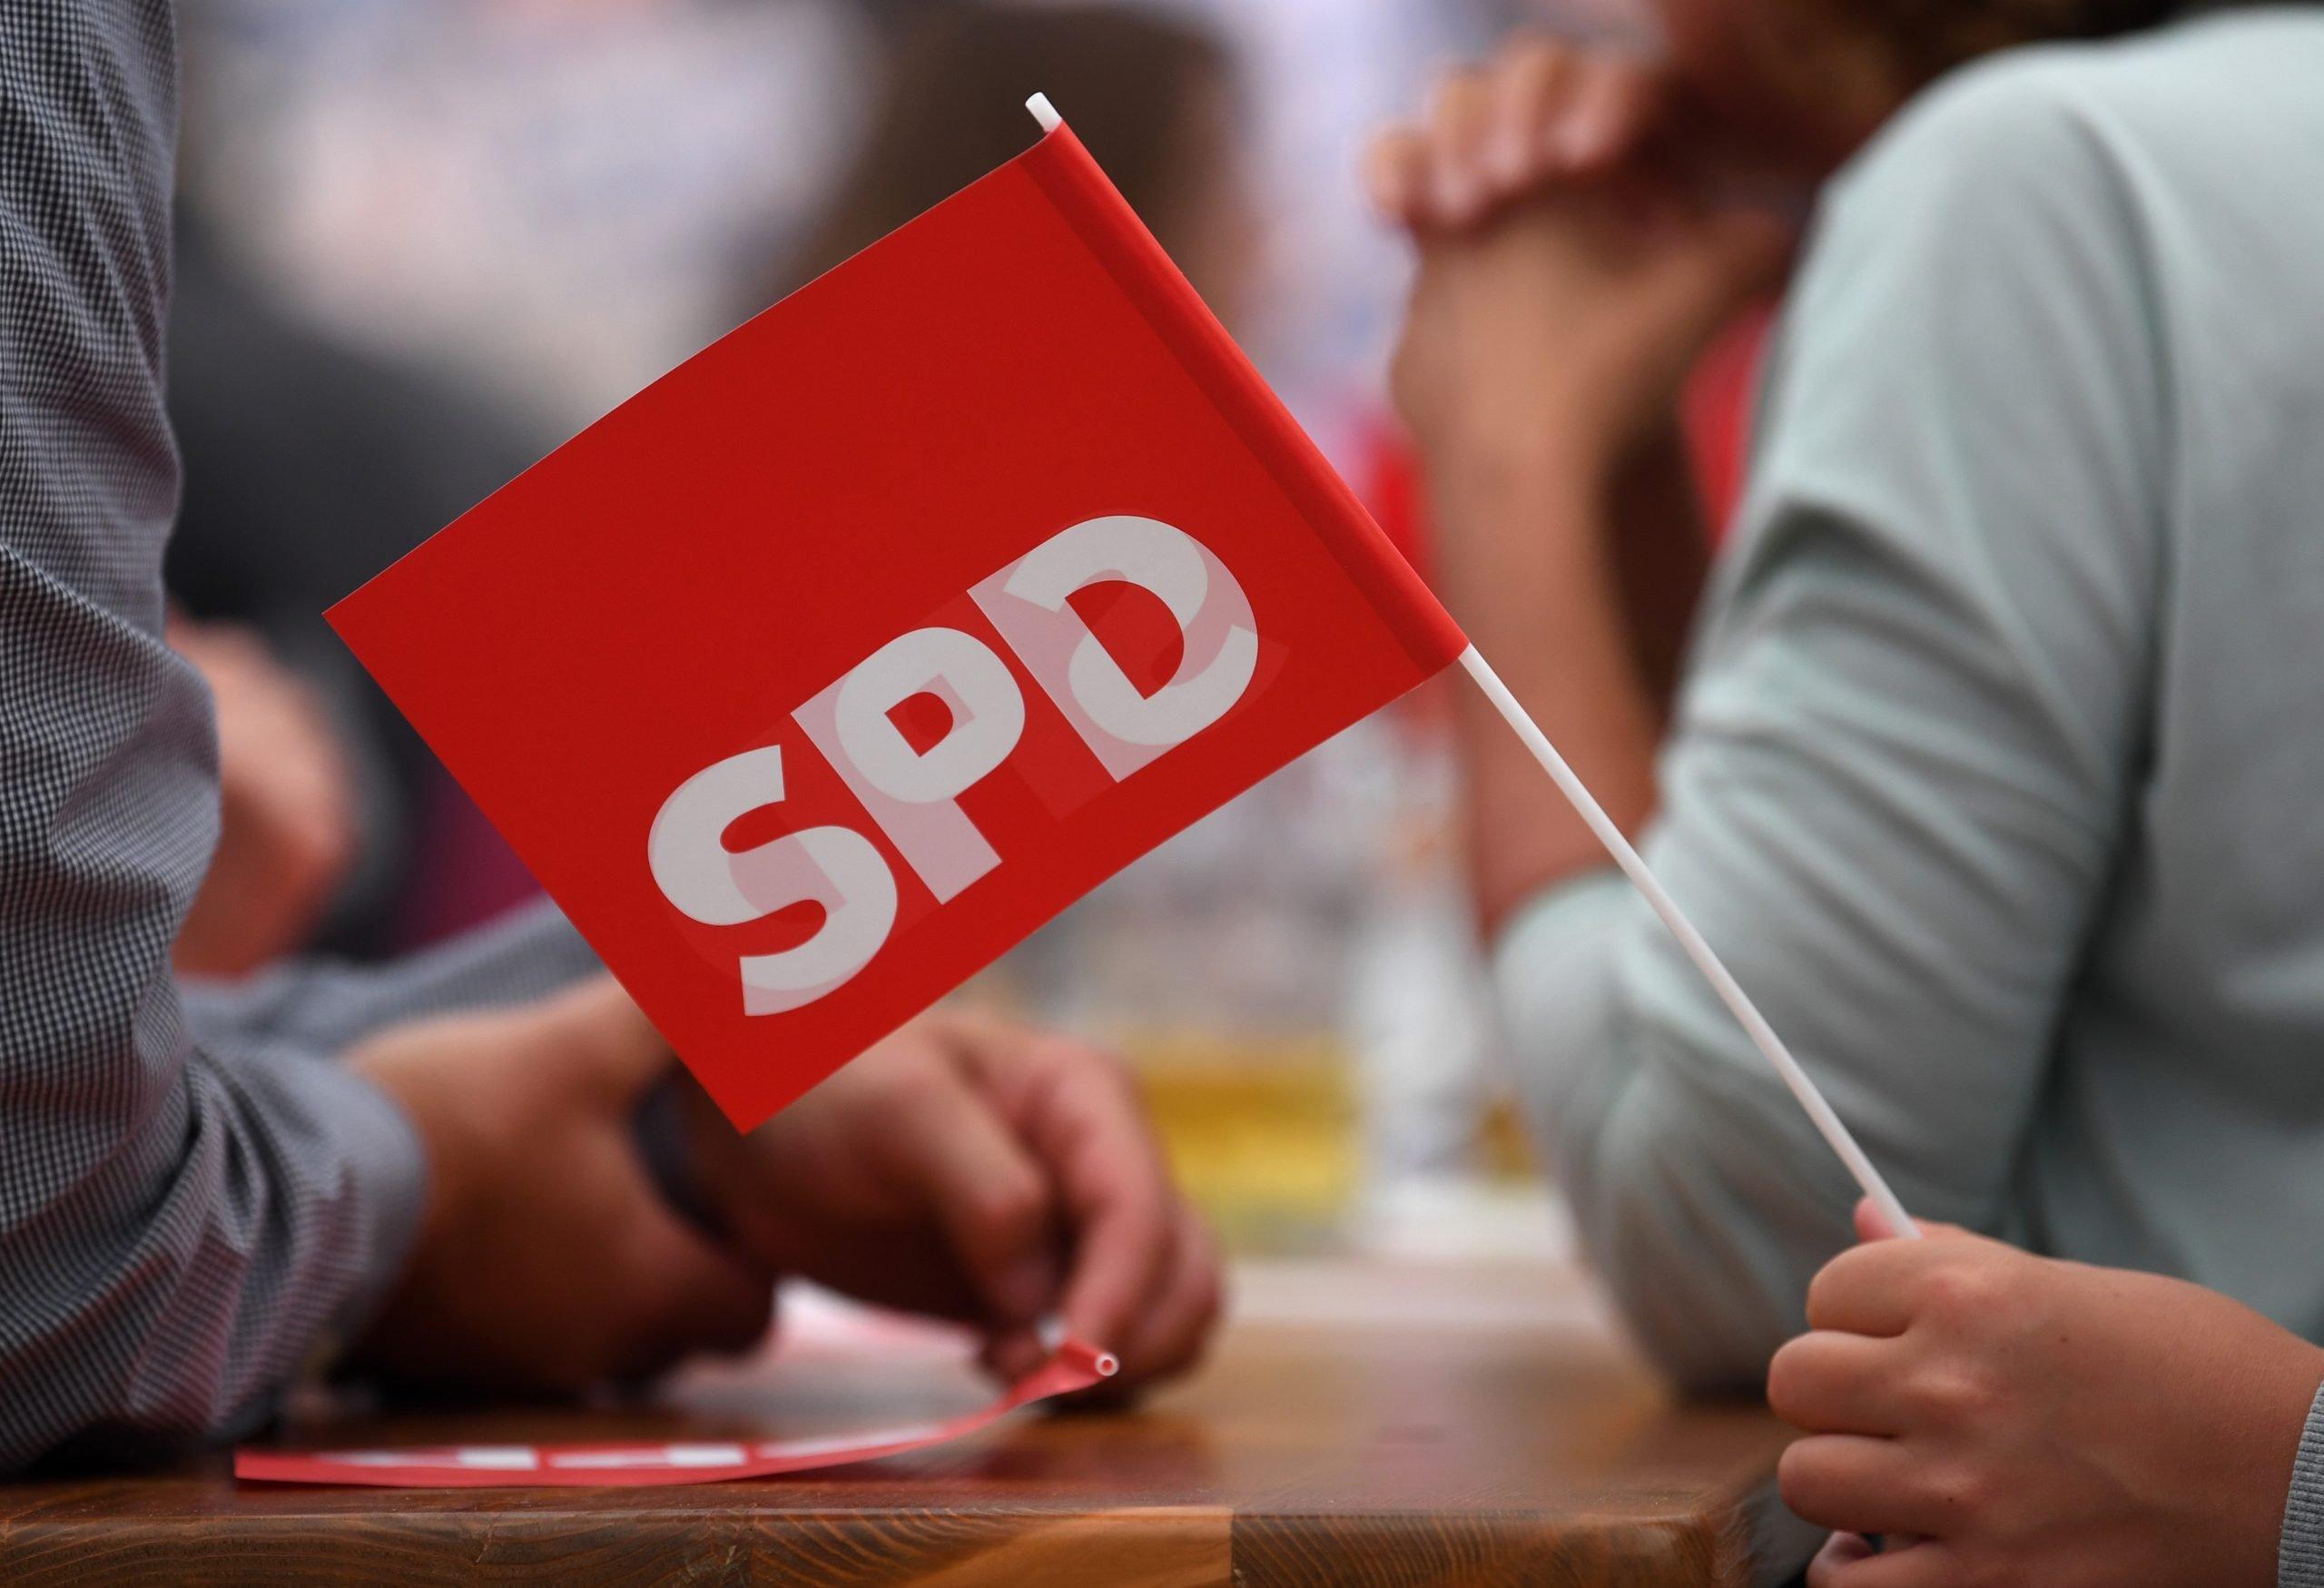 SPD vor Landtagswahl in Mecklenburg-Vorpommern laut Umfrage deutlich vorn